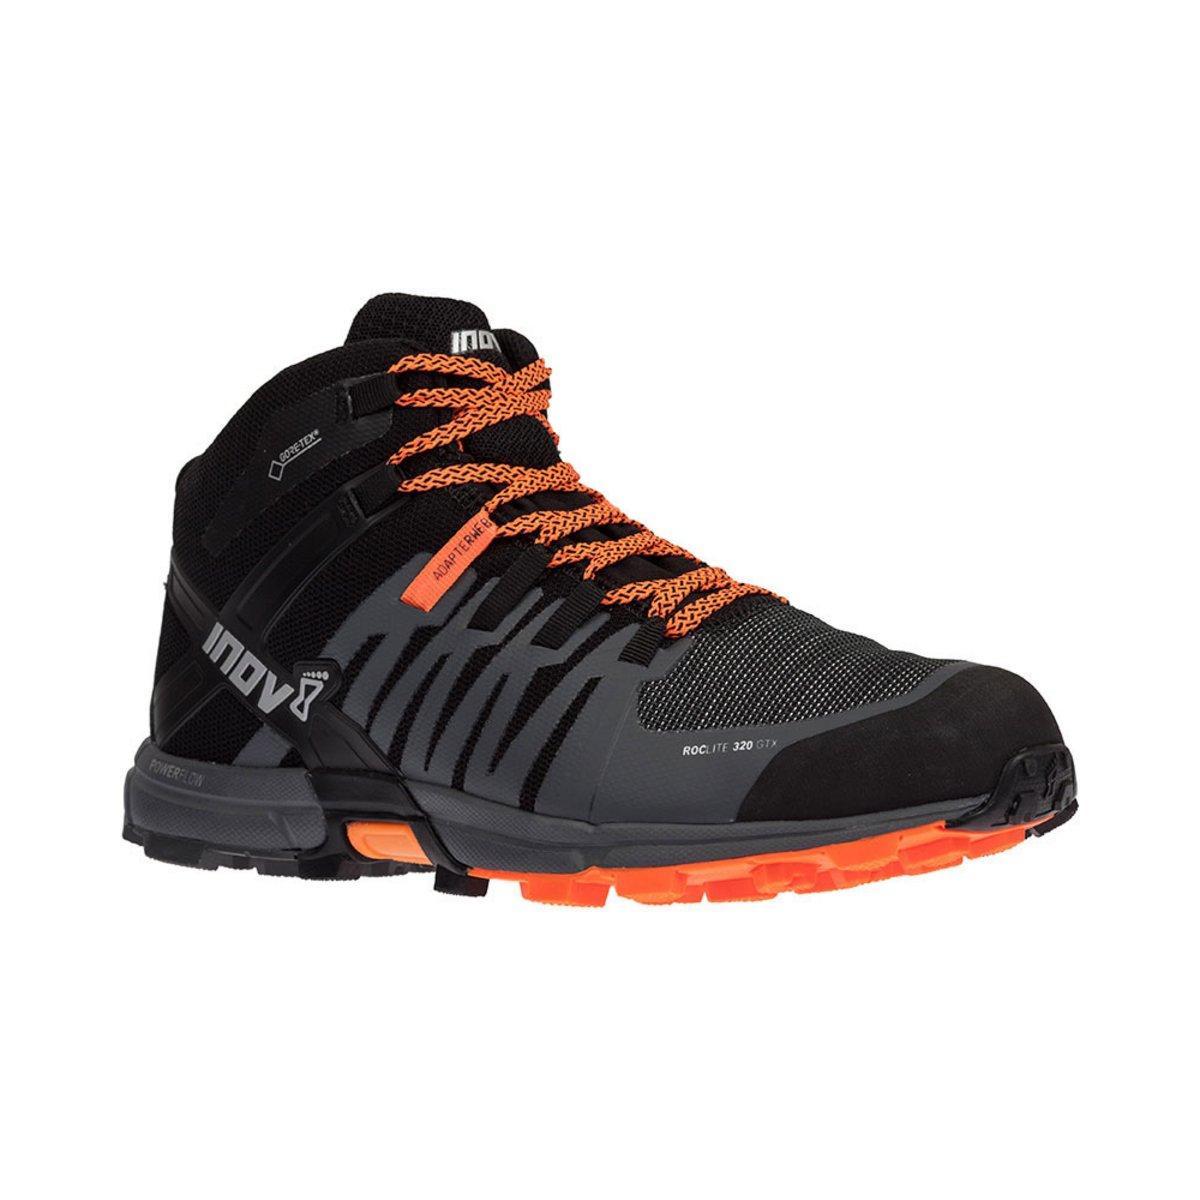 Inov-8 Men's Roclite 320 Mid GORE-TEX Walking Boots 0